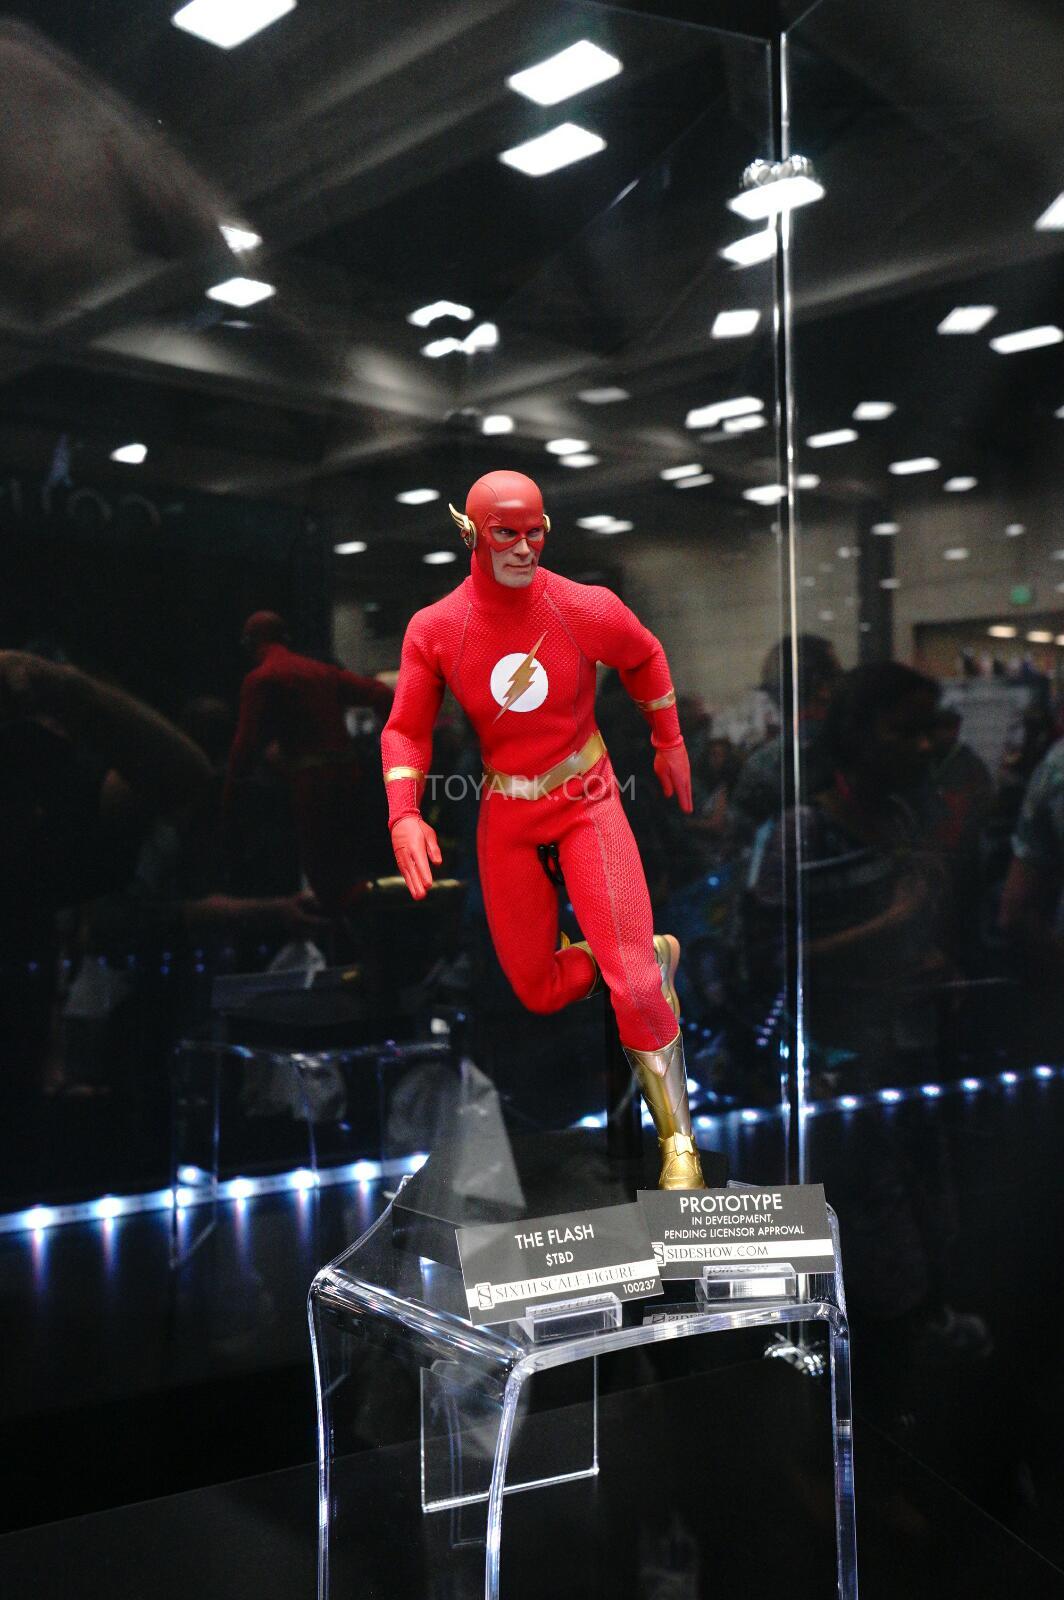 [Sideshow] DC Comics: Flash Sixth Scale Figure - Página 2 DSC07534